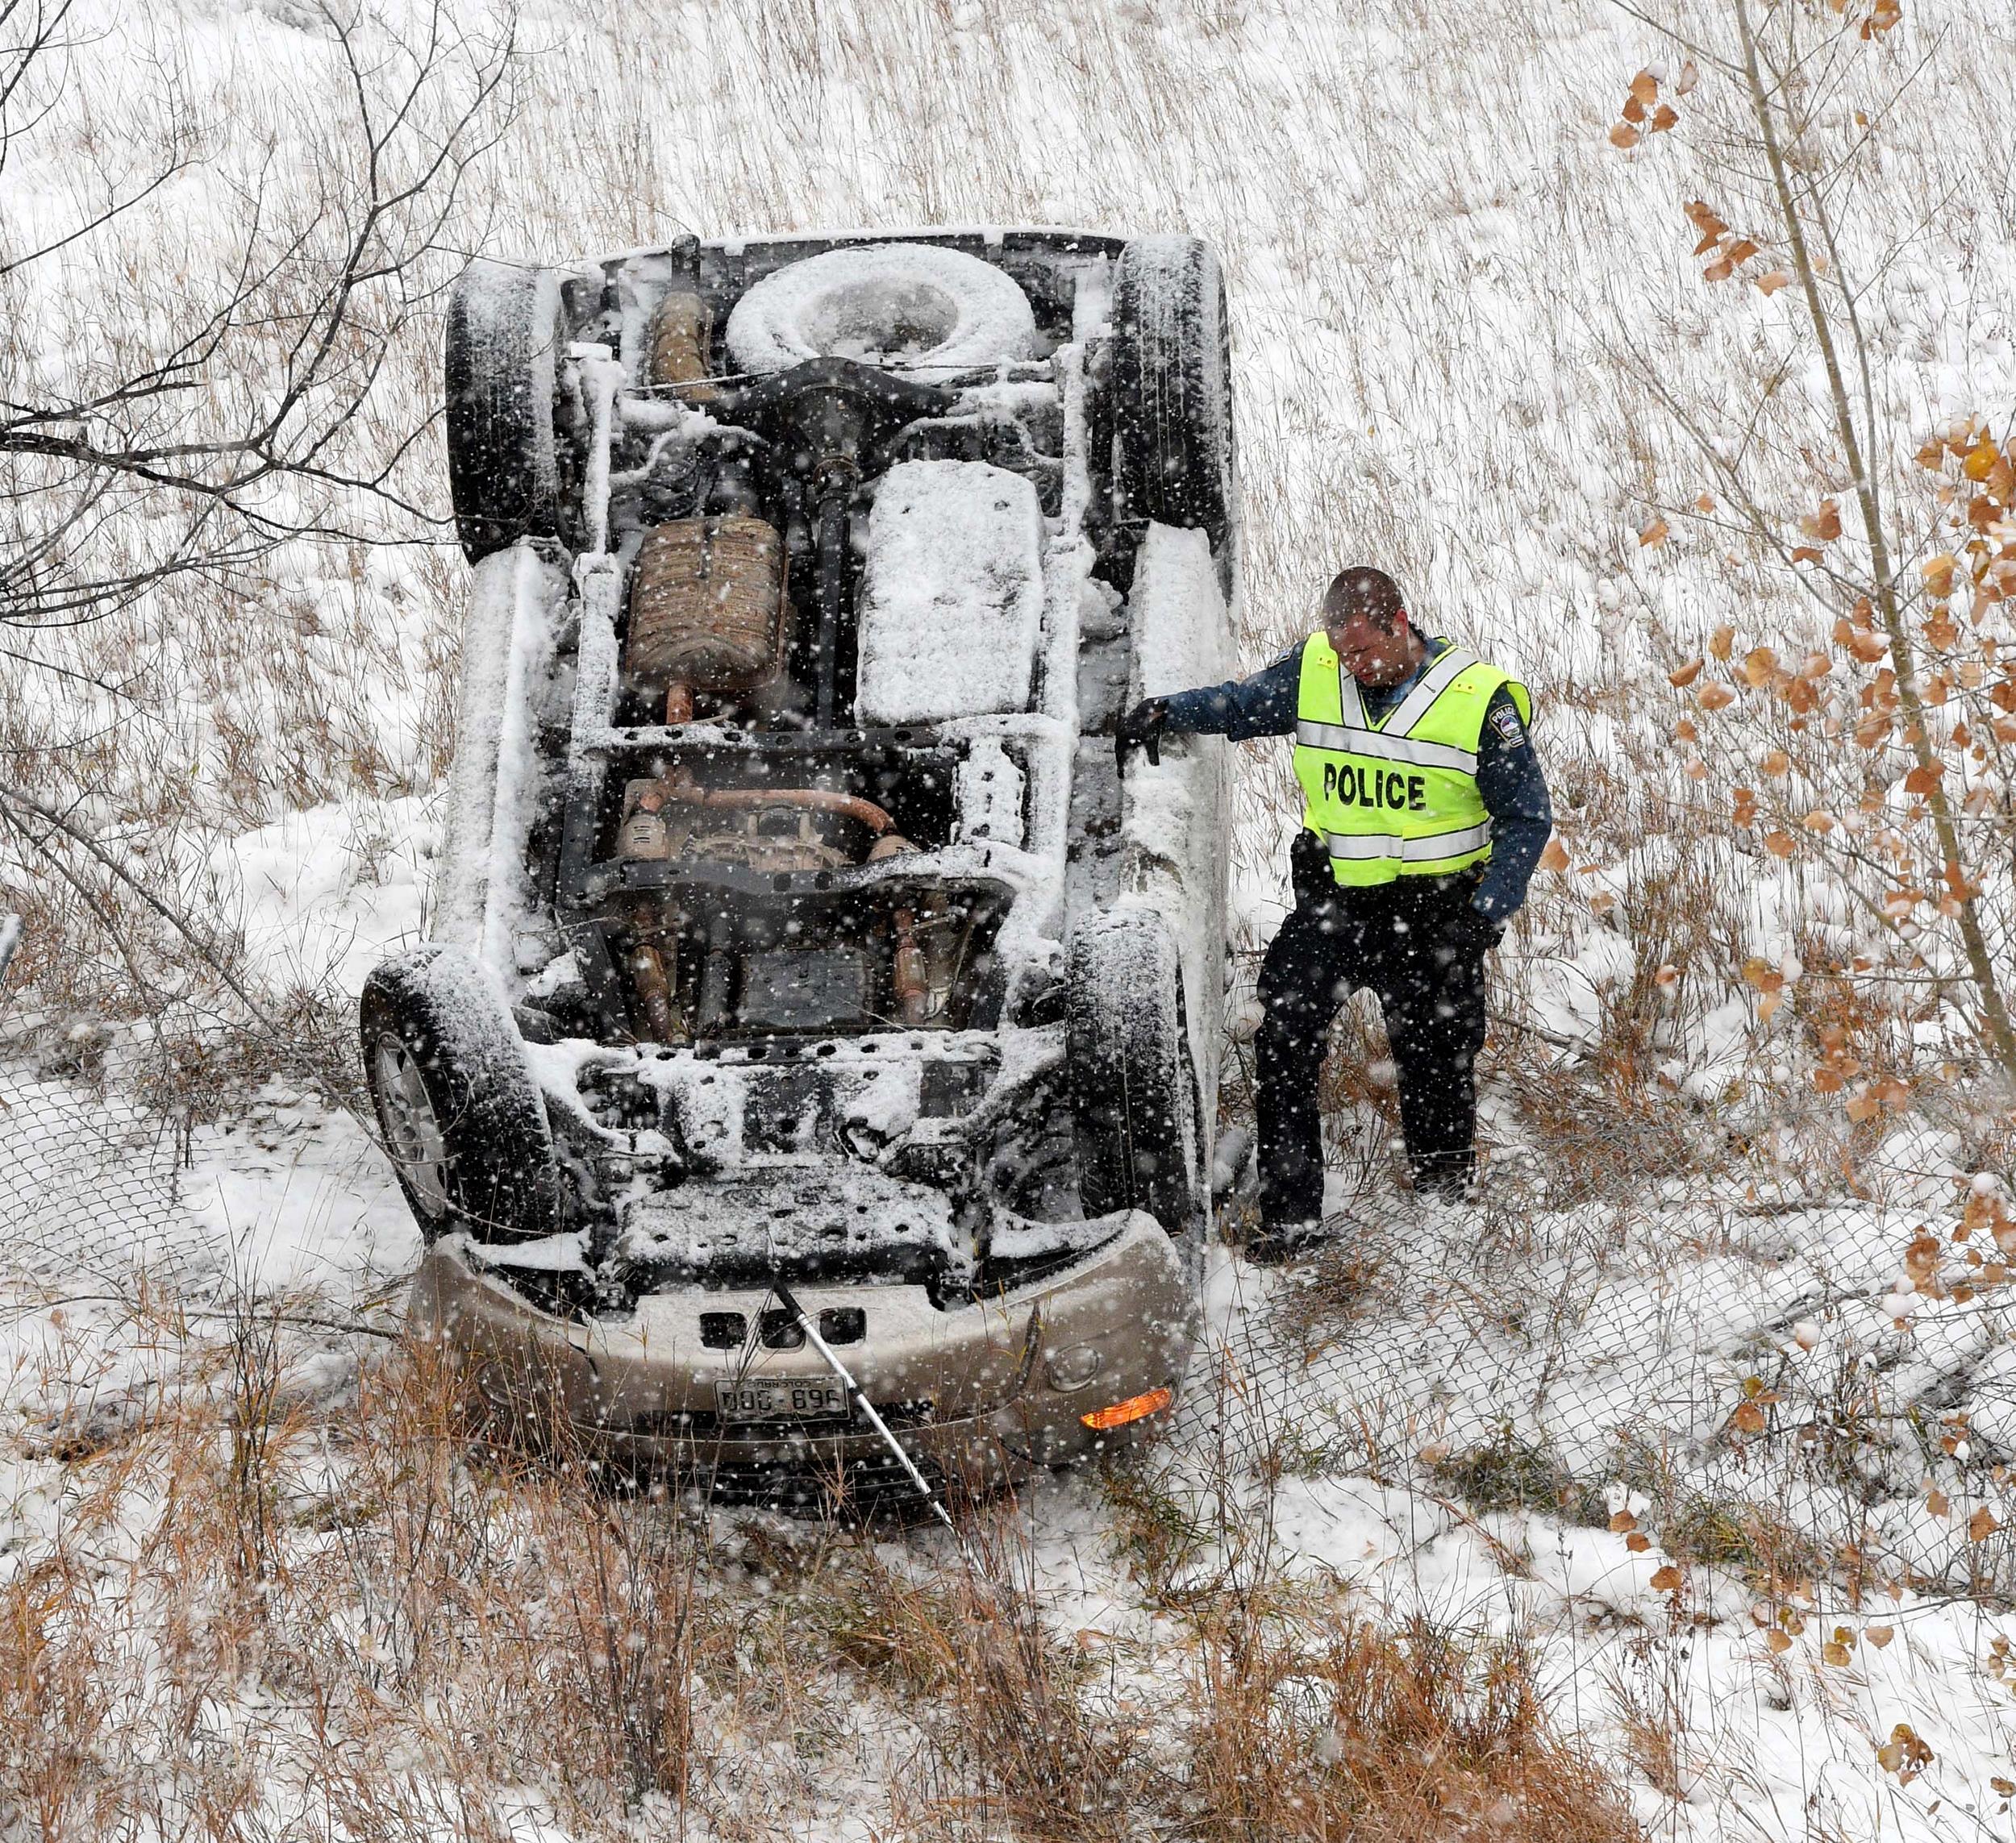 'Classic Arctic Outbreak': Winter Storm Puts Millions On